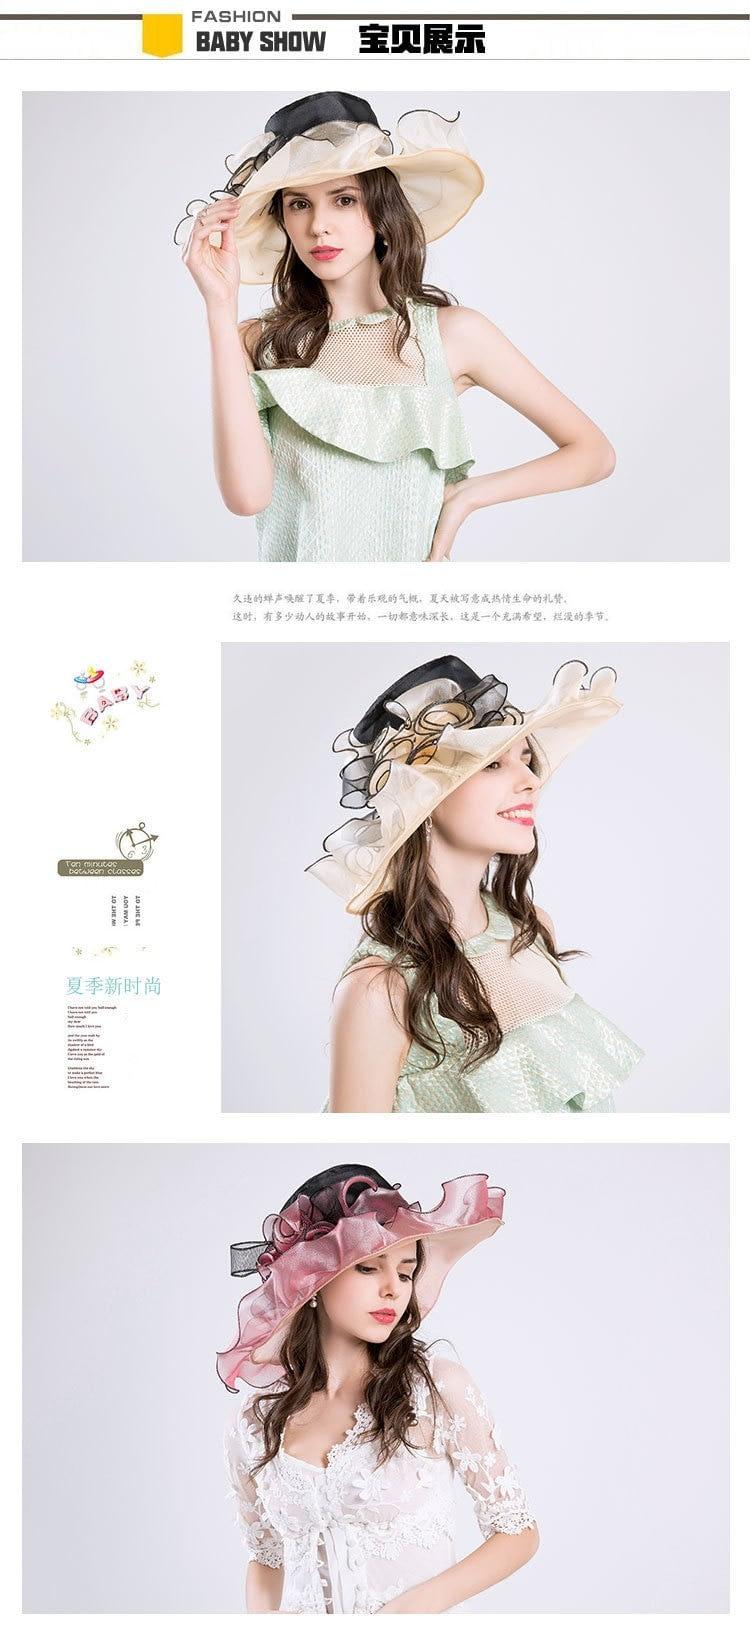 Summer Fashion Aristocratic Sombreros Hat, Wide Large Brim, Elegant Flower, Ladies Hat 7